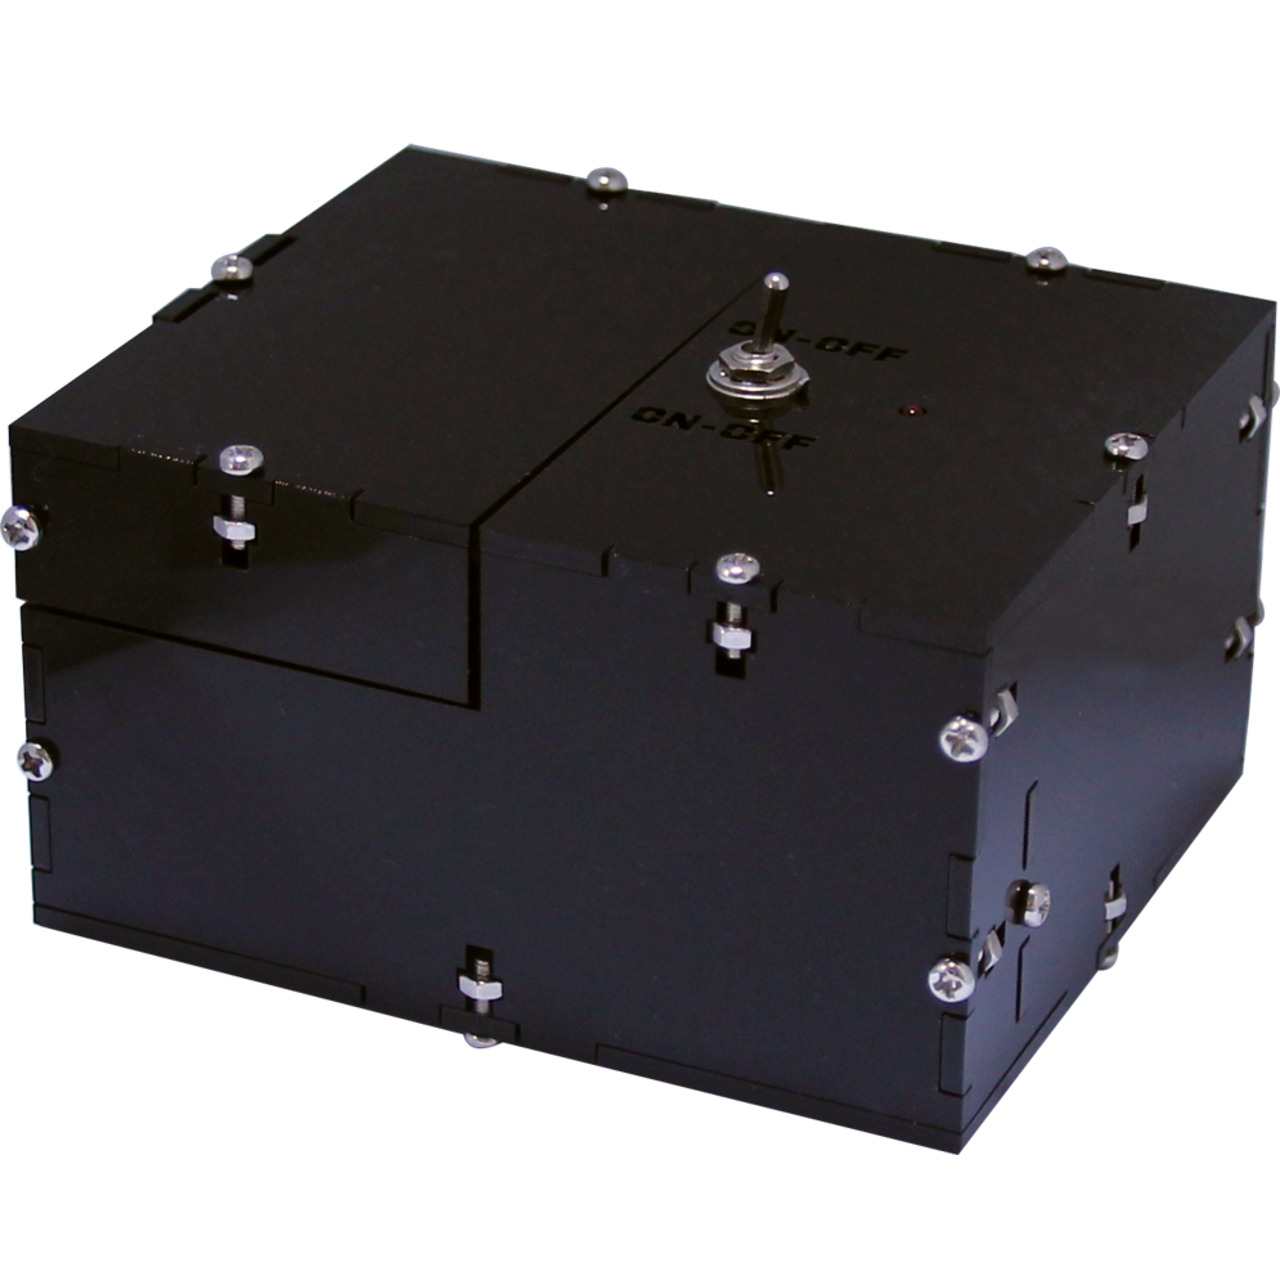 Image of AREXX Bausatz Useless Box - Useless Machine ARX-UM1